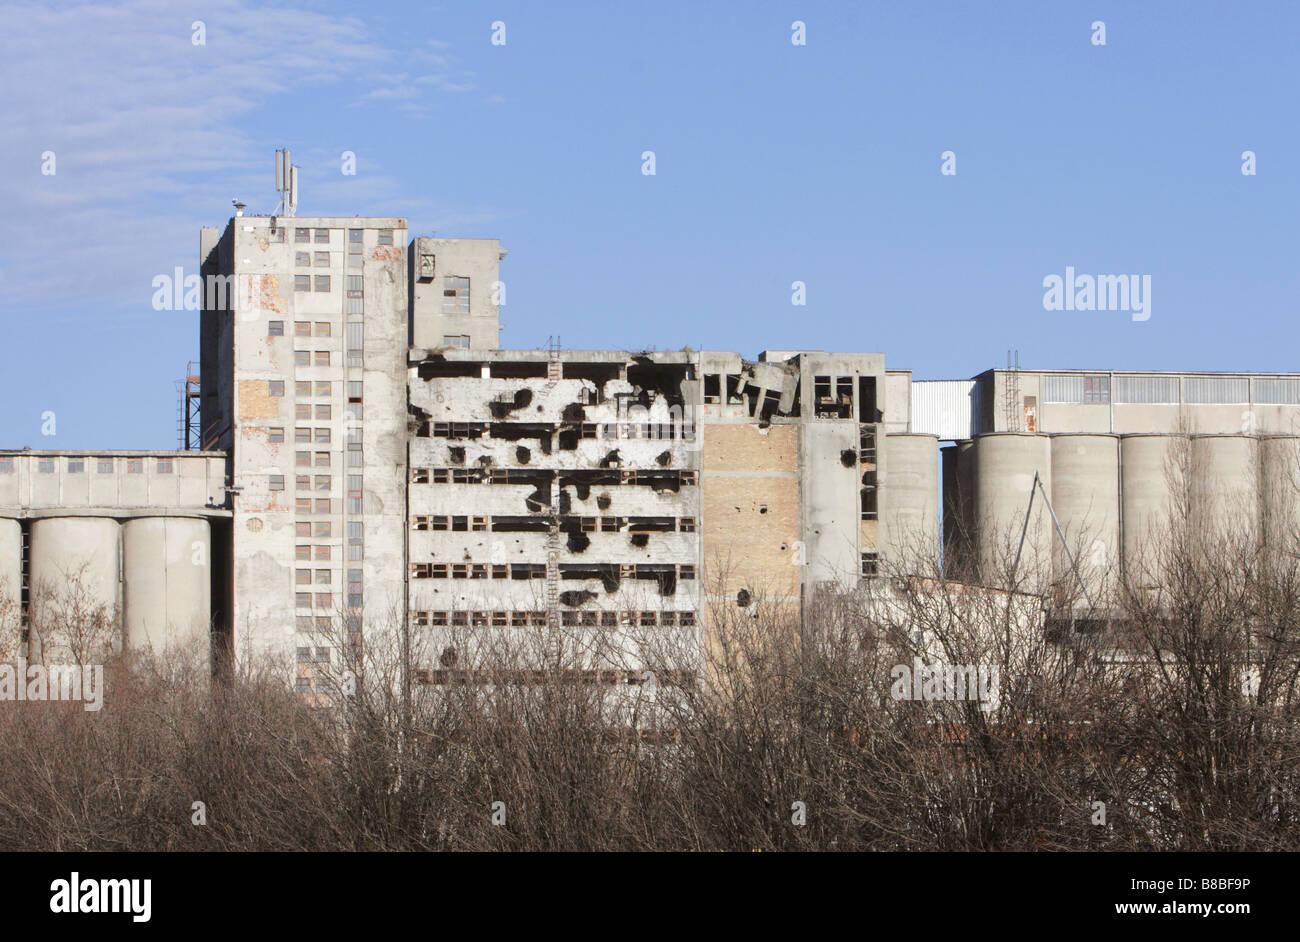 Silos Damaged from War 1990's, Vukovar, Eastern Croatia Stock Photo